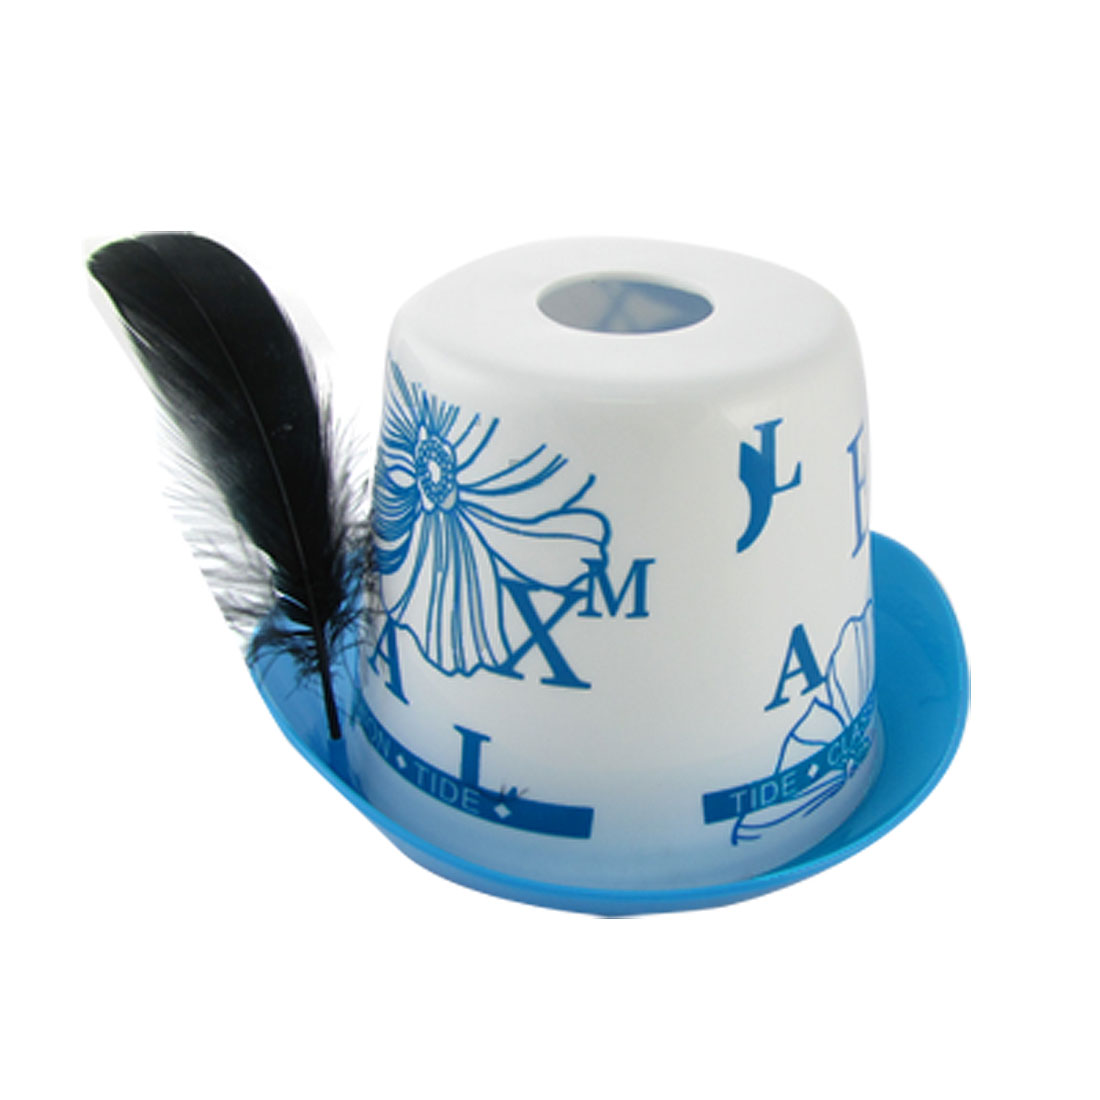 Blue White Flowers Print Cowboy Hat Shape Tissue Box Holder